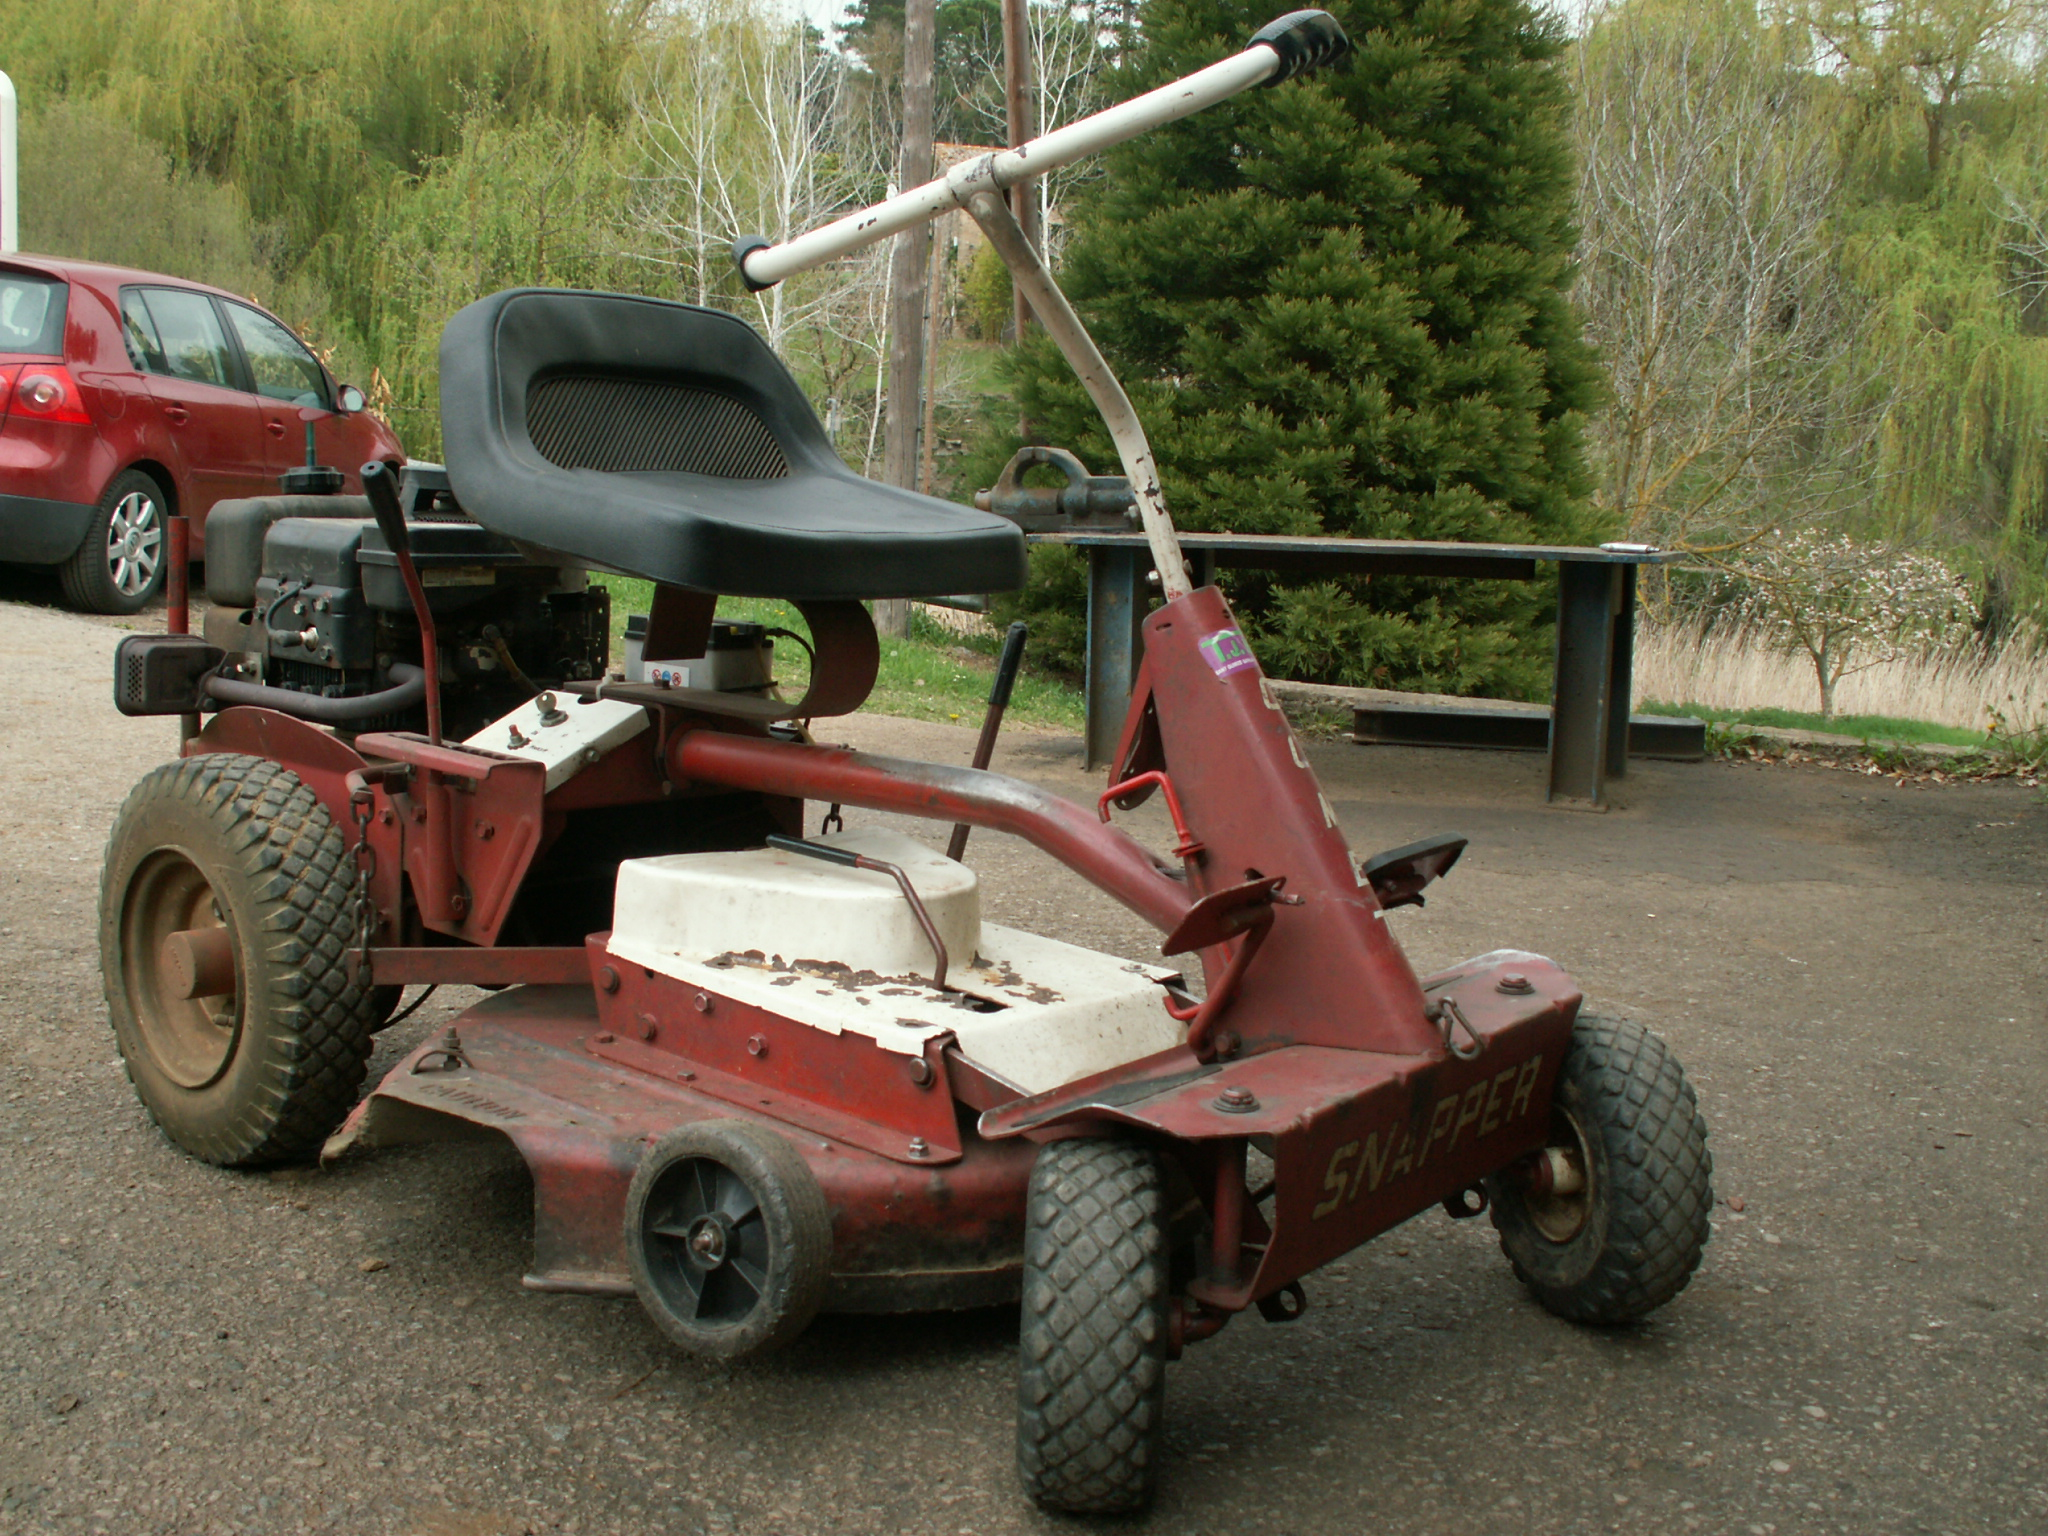 Tractor cortacesped snapper taller j bou for Alquiler de cortacesped